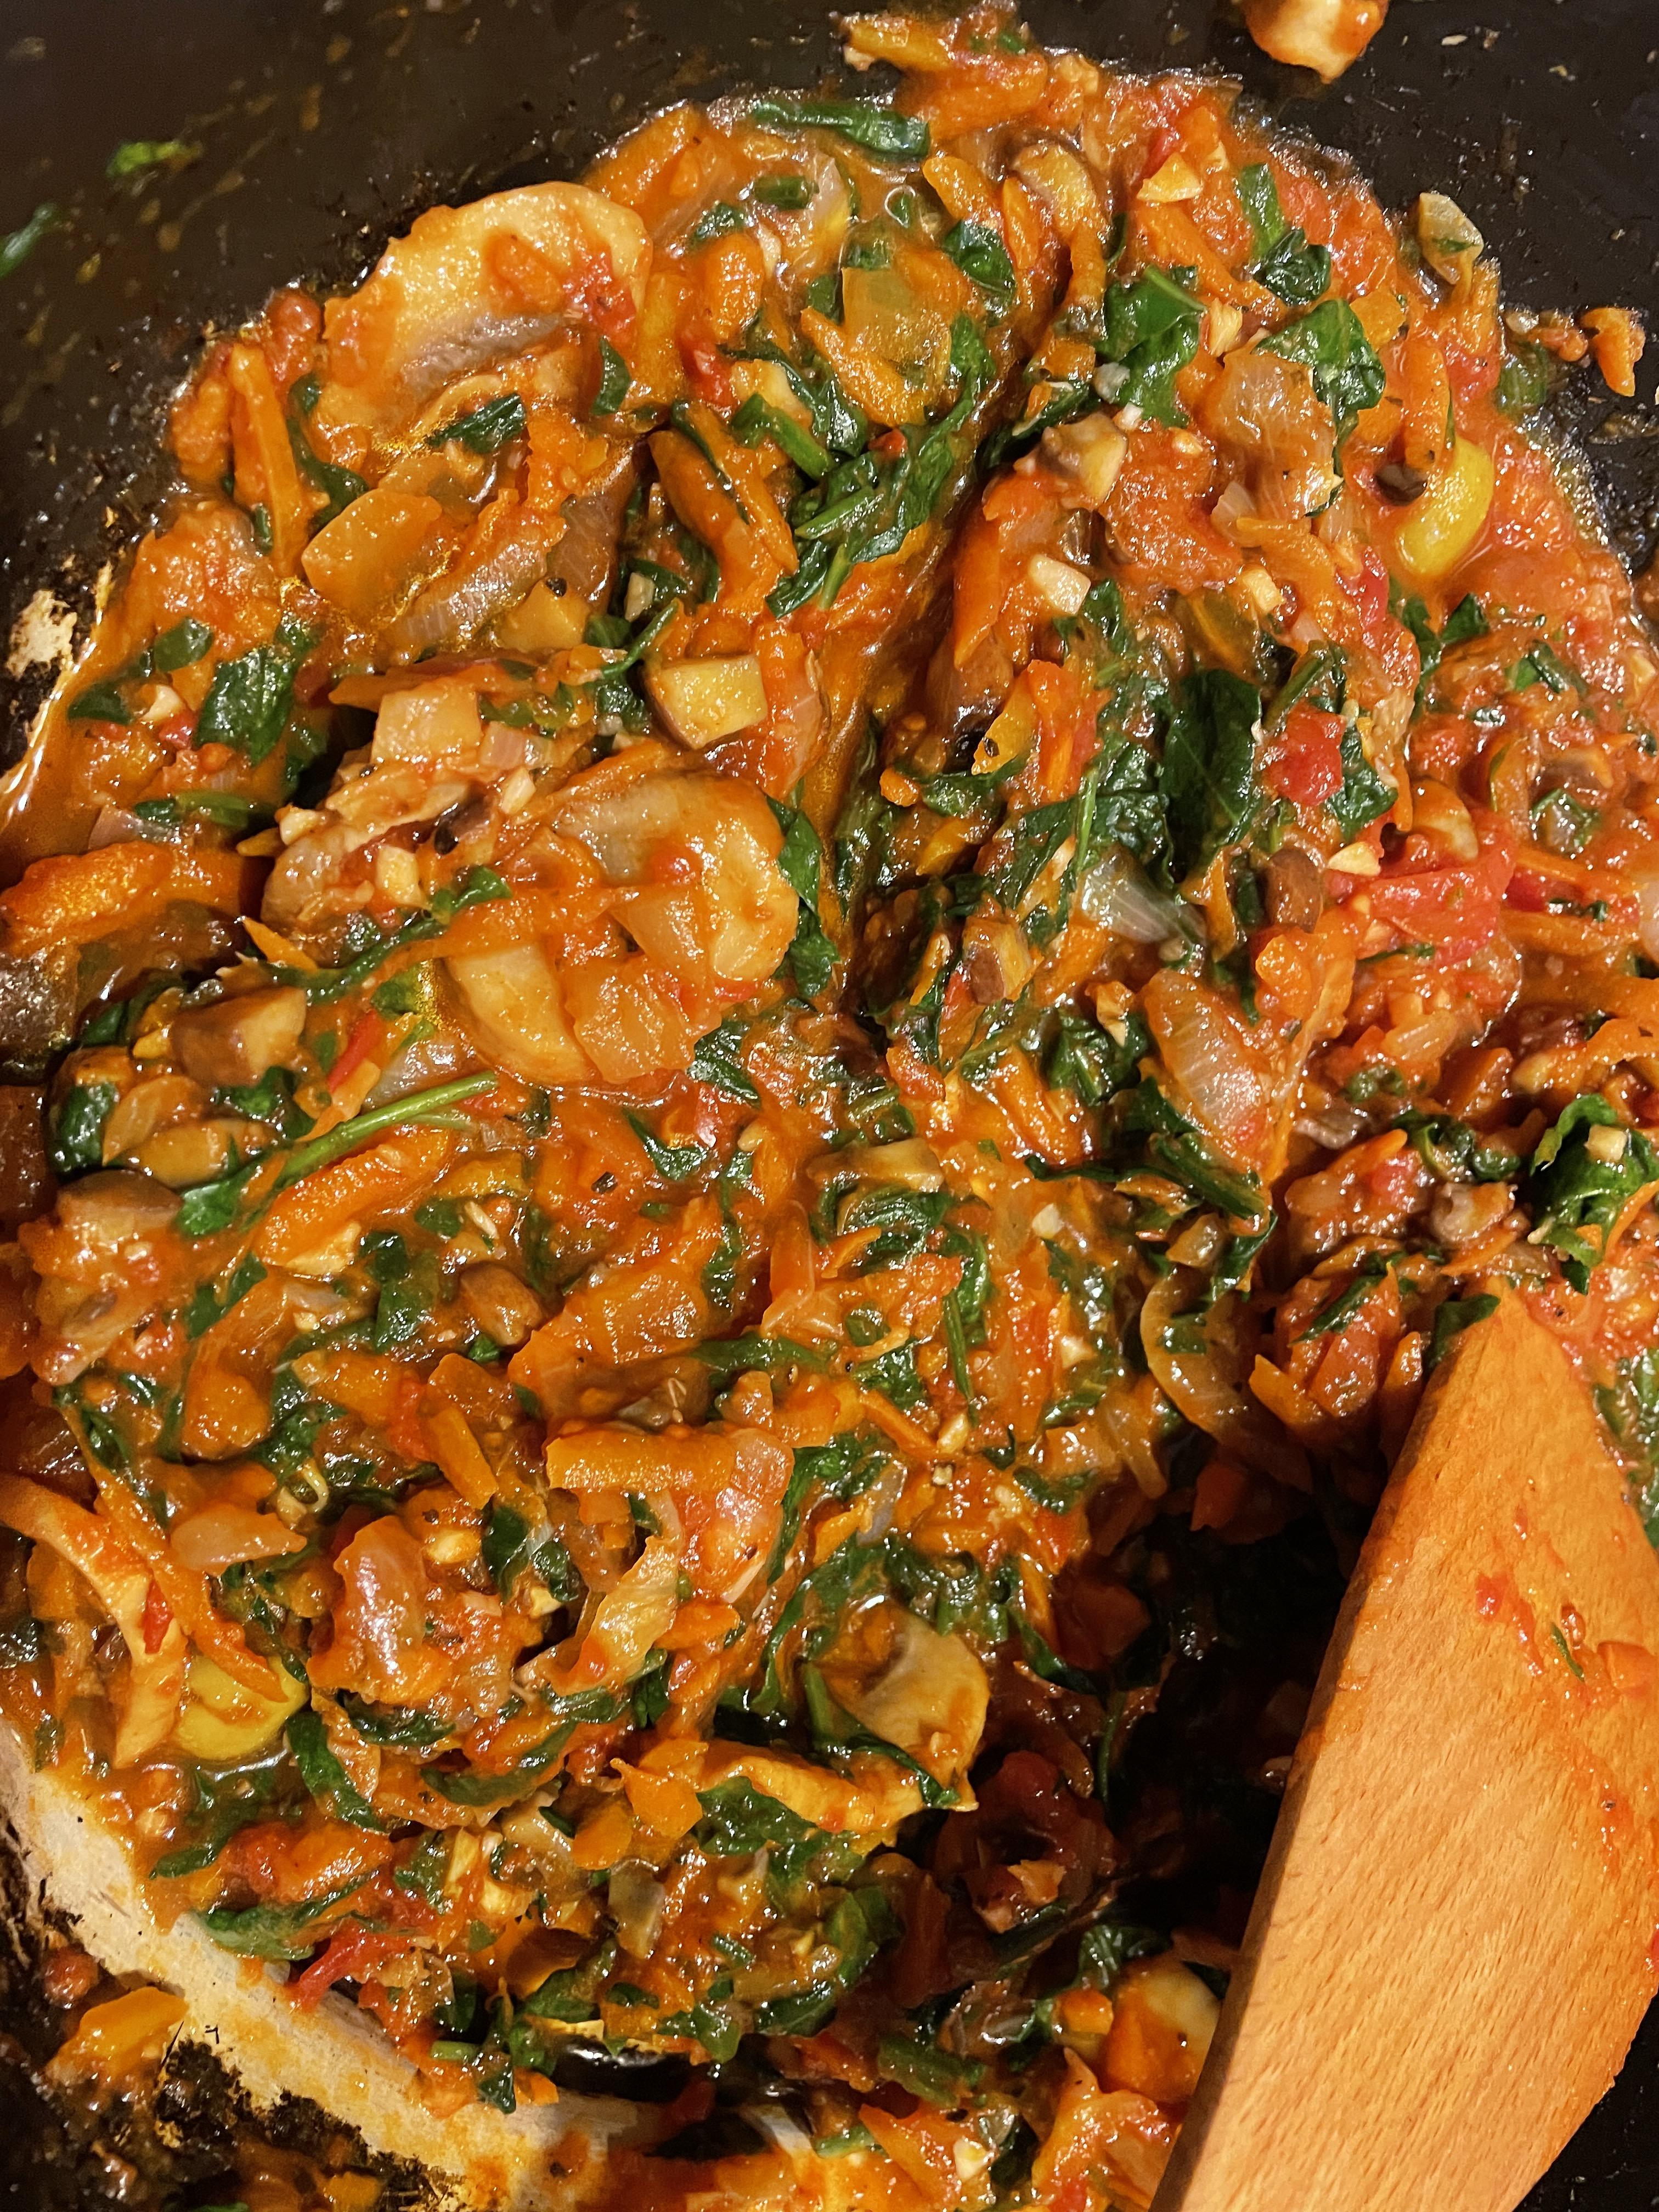 Veggies with italian mushroom sauce added